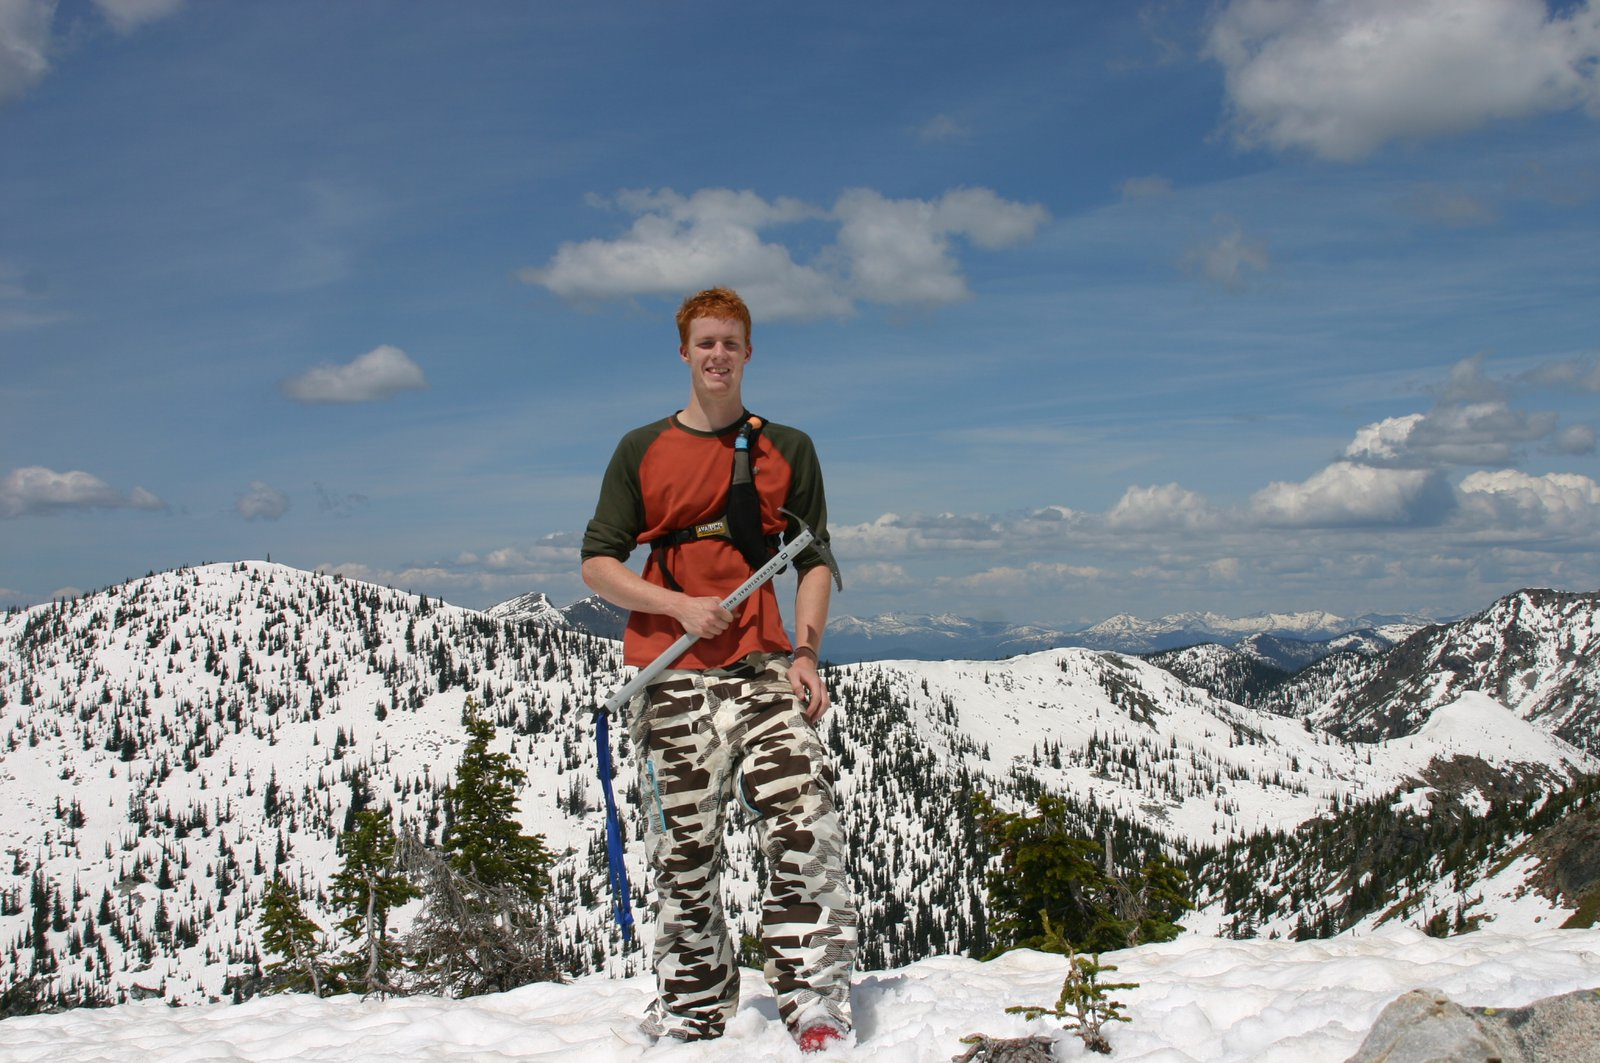 Kootenay Pass, B.C Ski Mountaineering